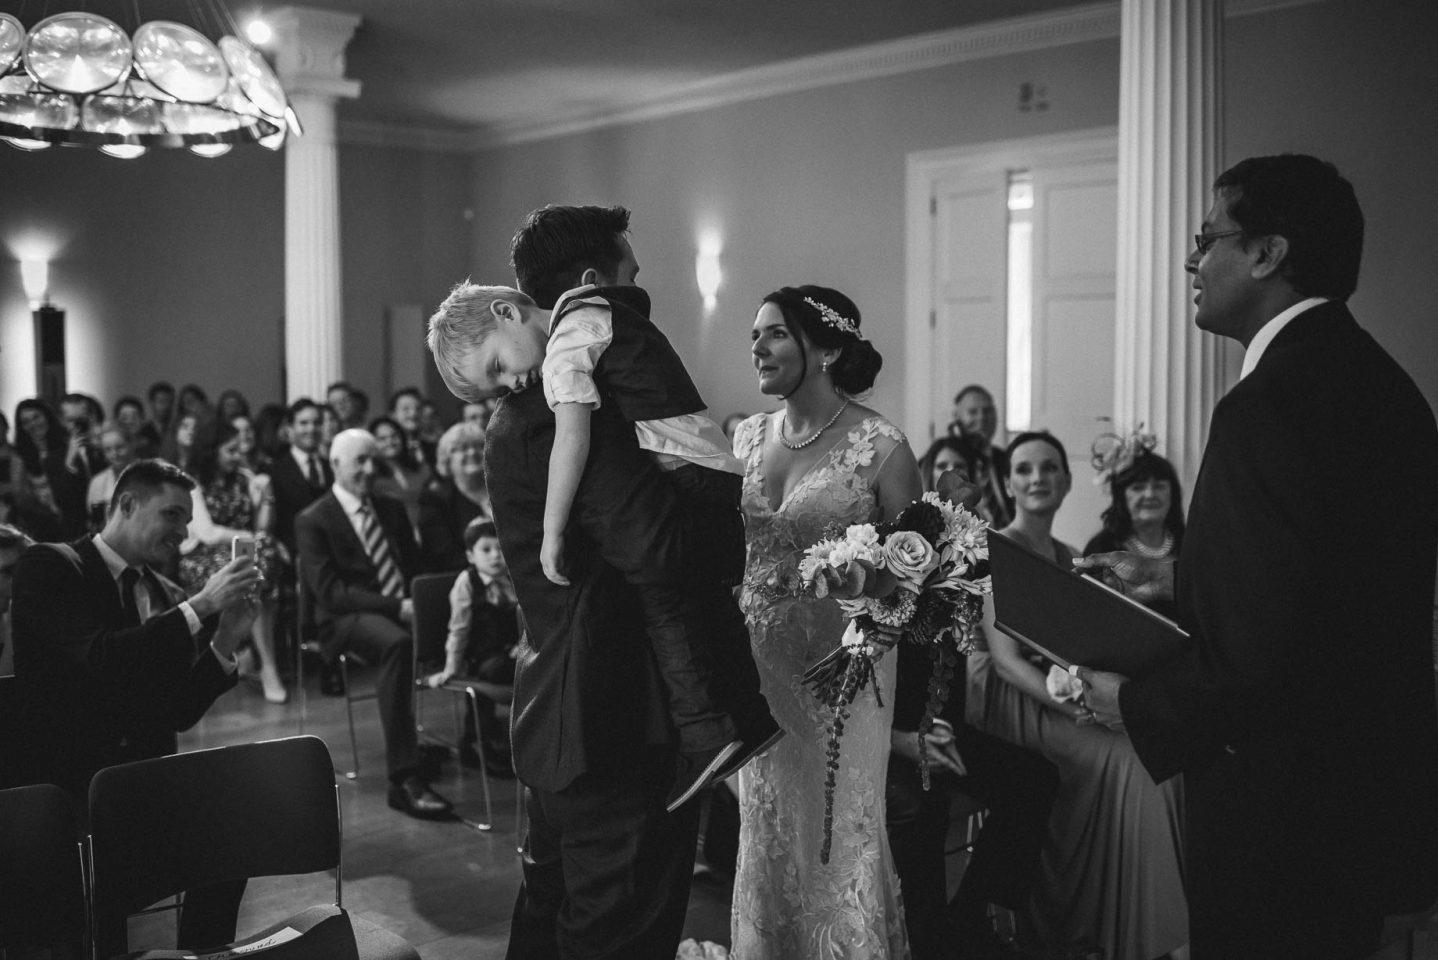 London wedding photography at the RSA